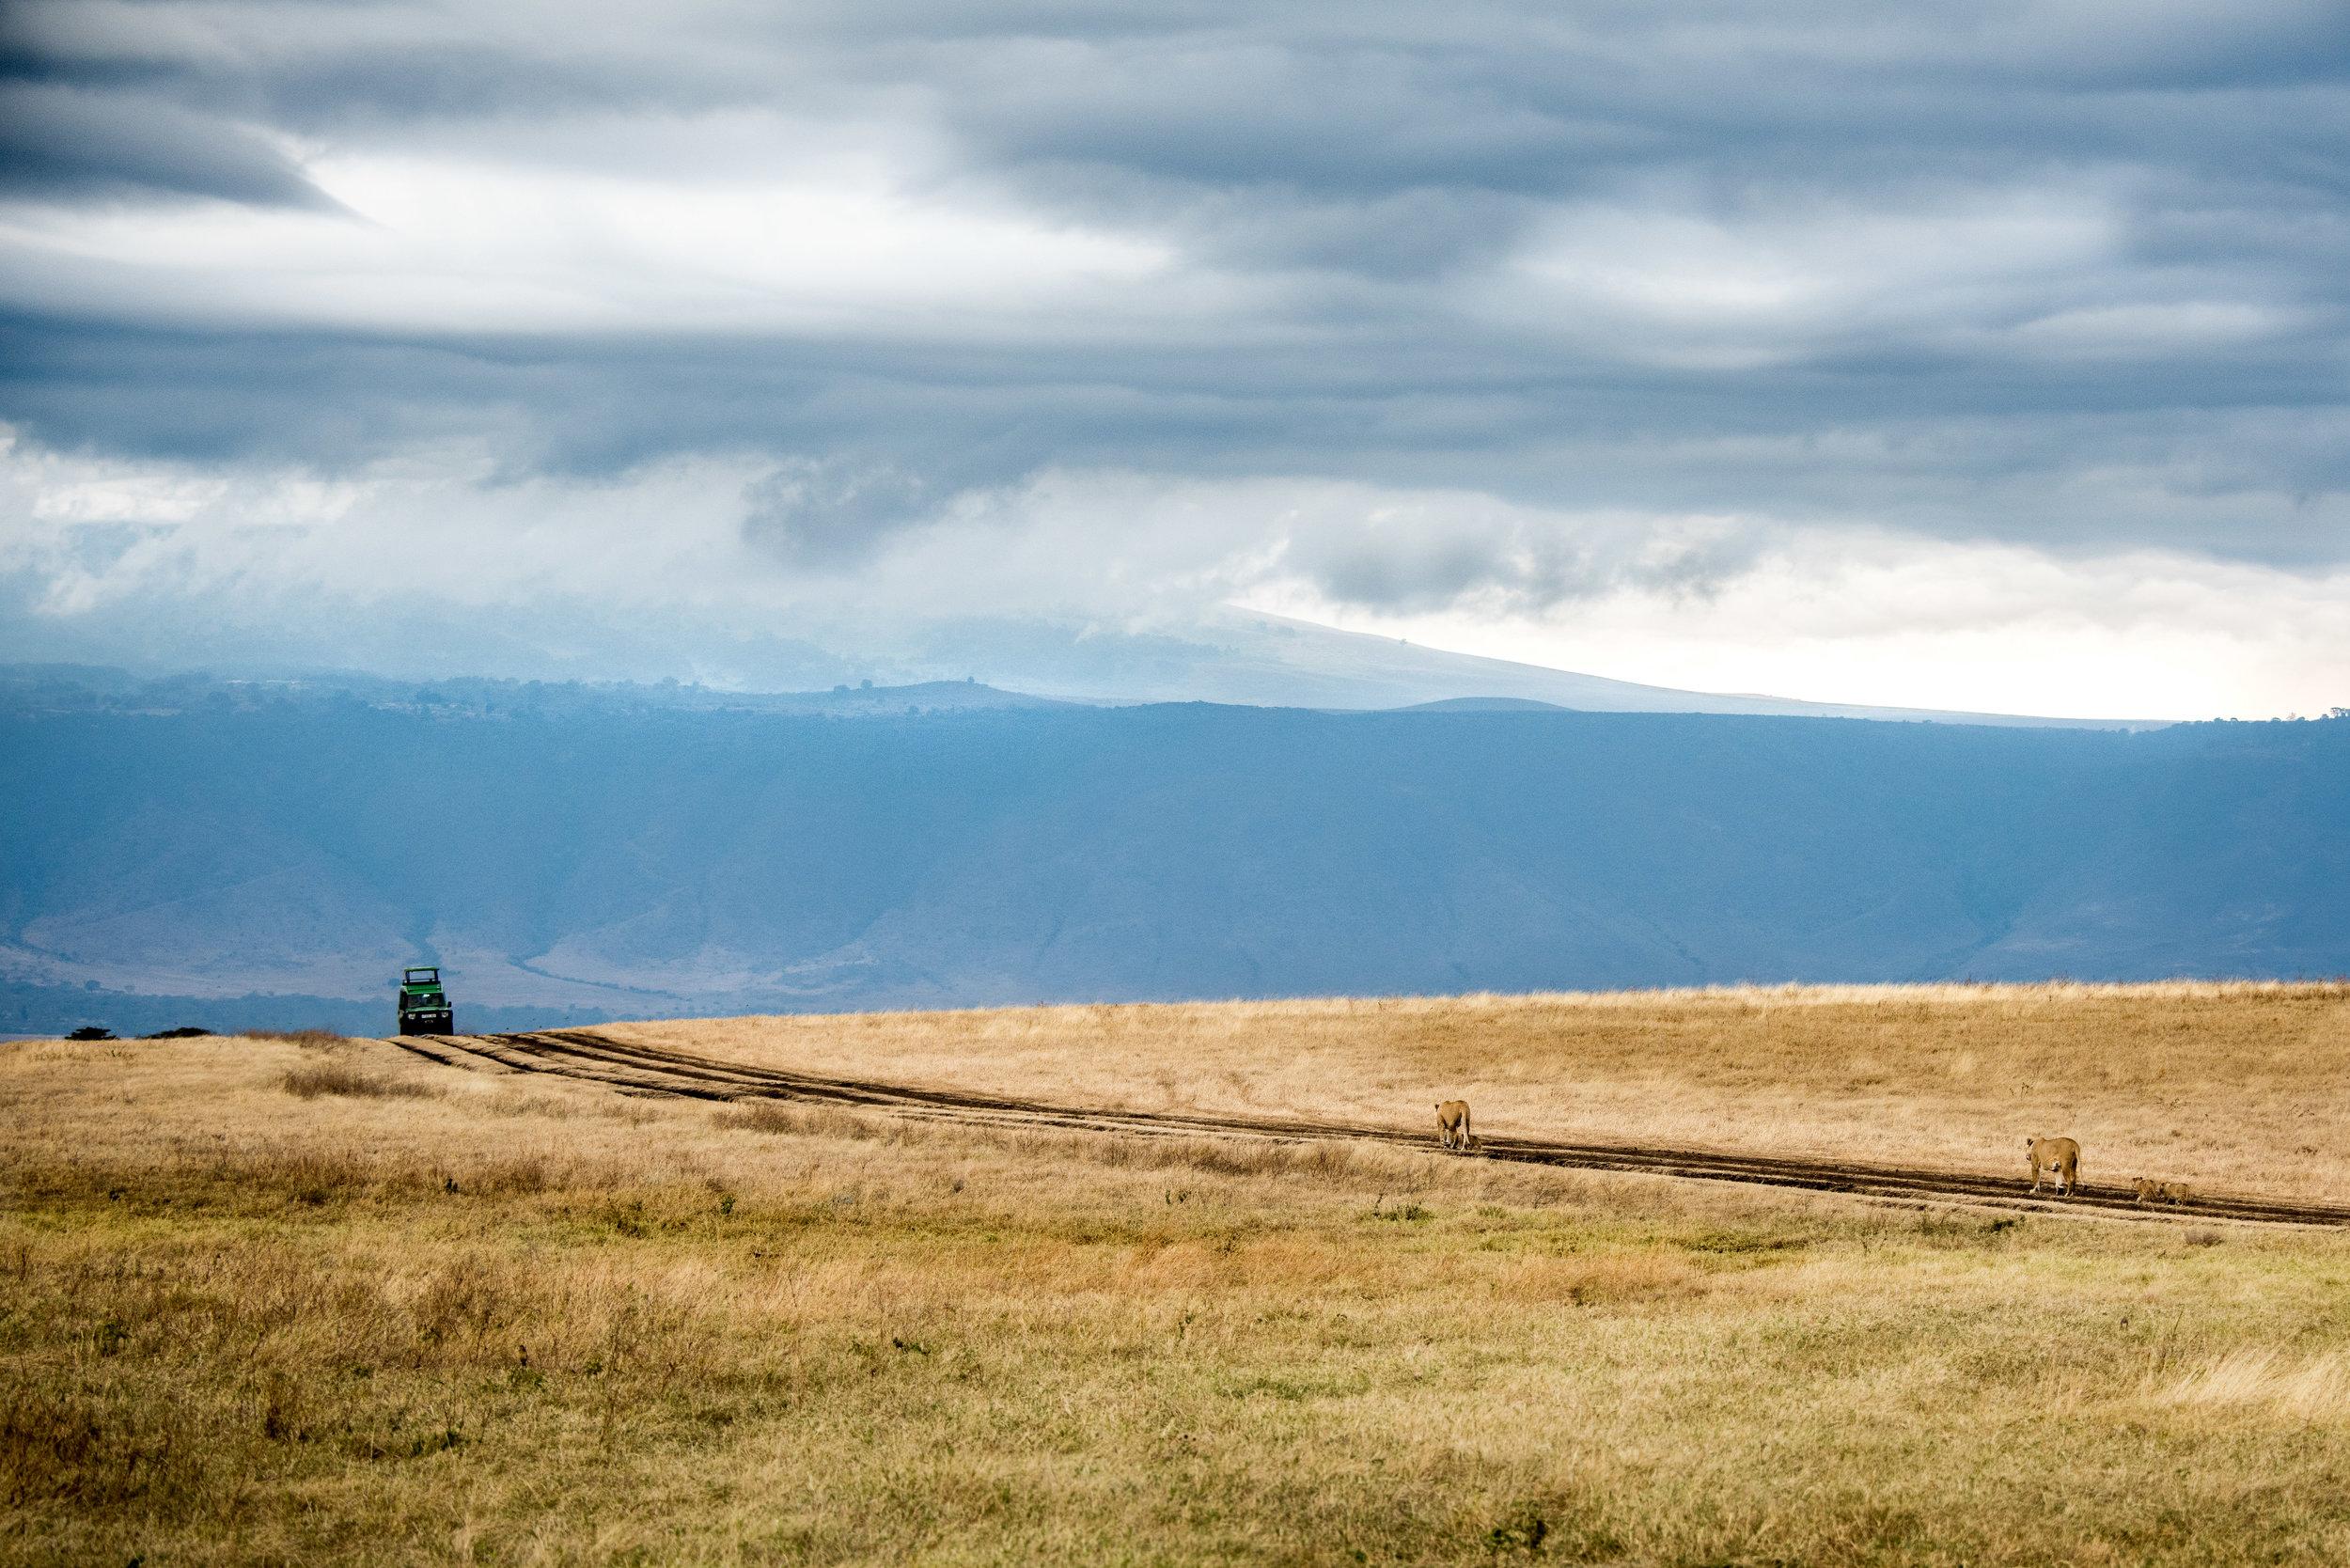 Tanzania-Earth-Photo-By-Tricia-Suriani-Ramsay-12.jpg